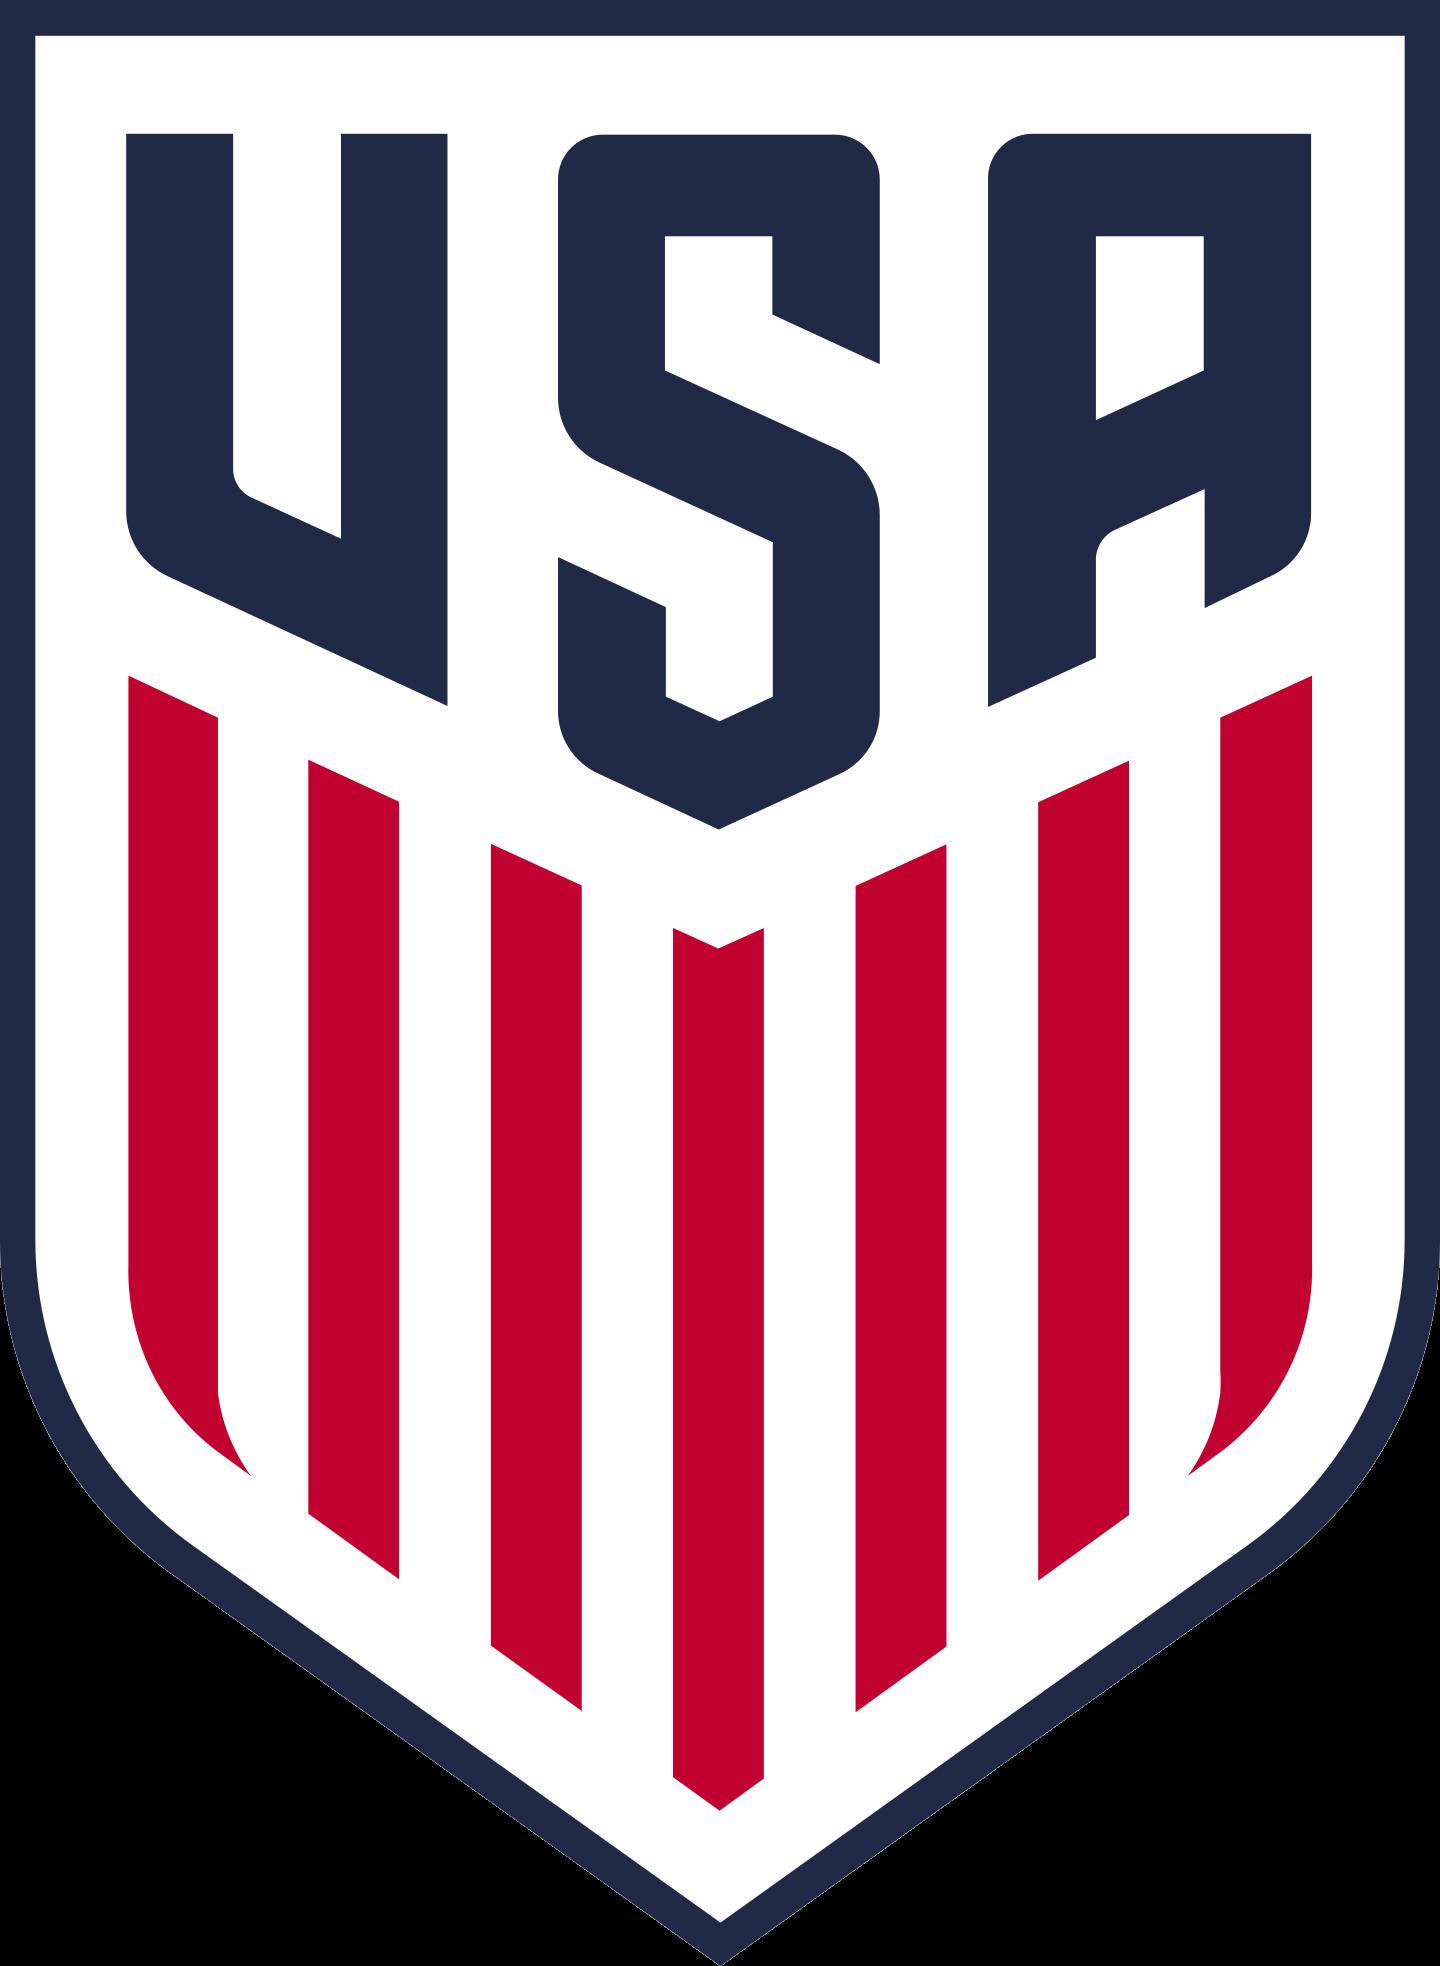 united states national soccer team logo 2 - United States National Soccer Team Logo